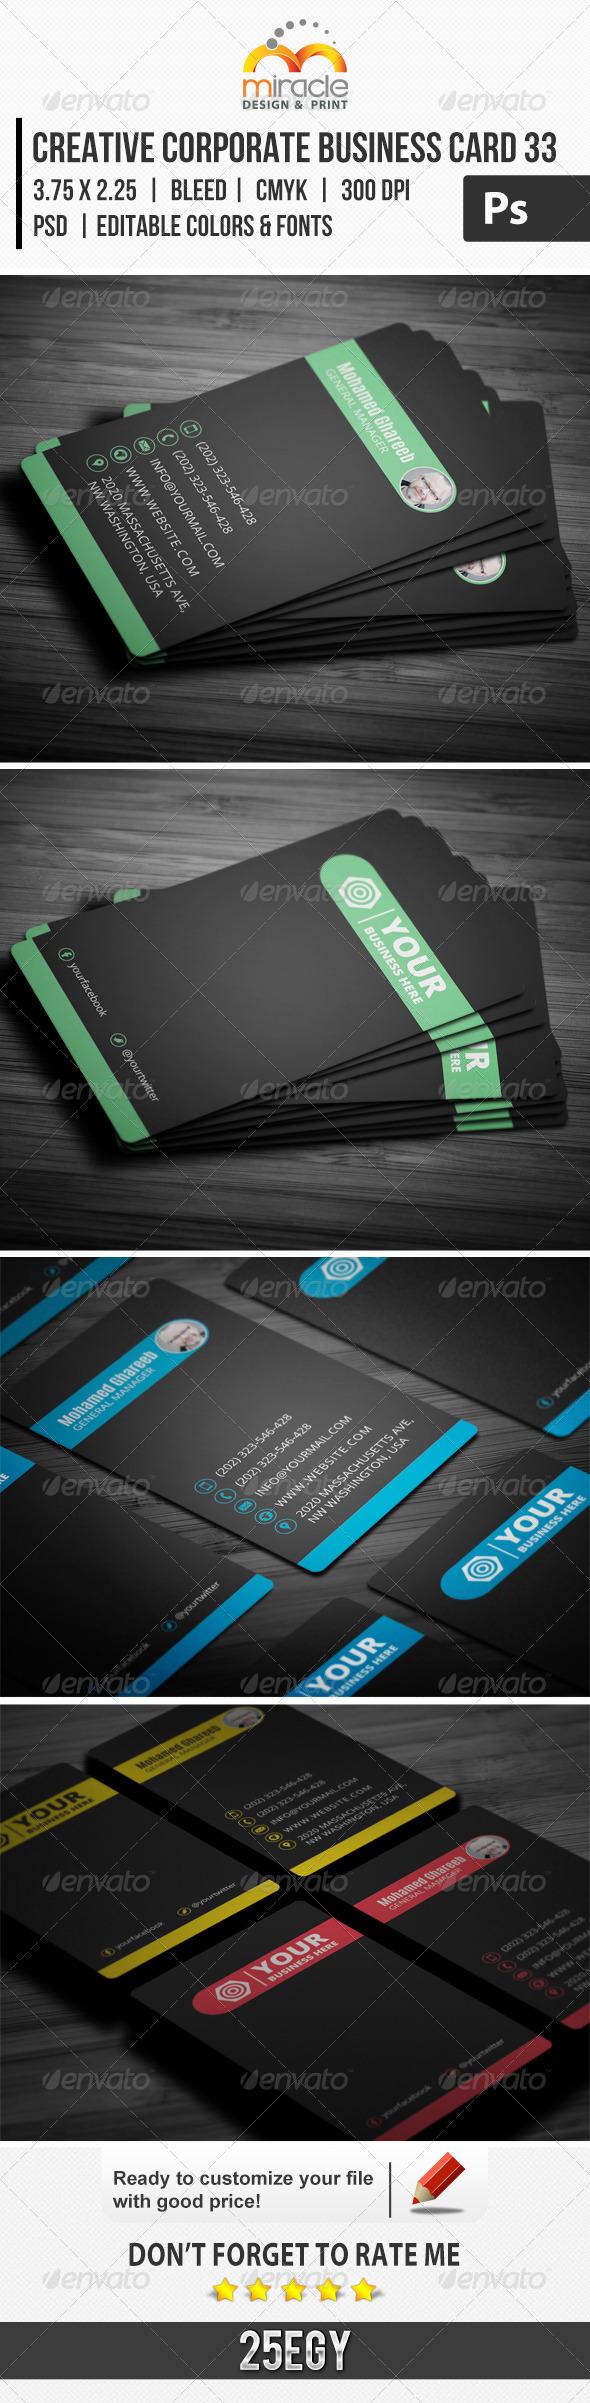 Creative Corporate Business Card 33 - Corporate Business Cards